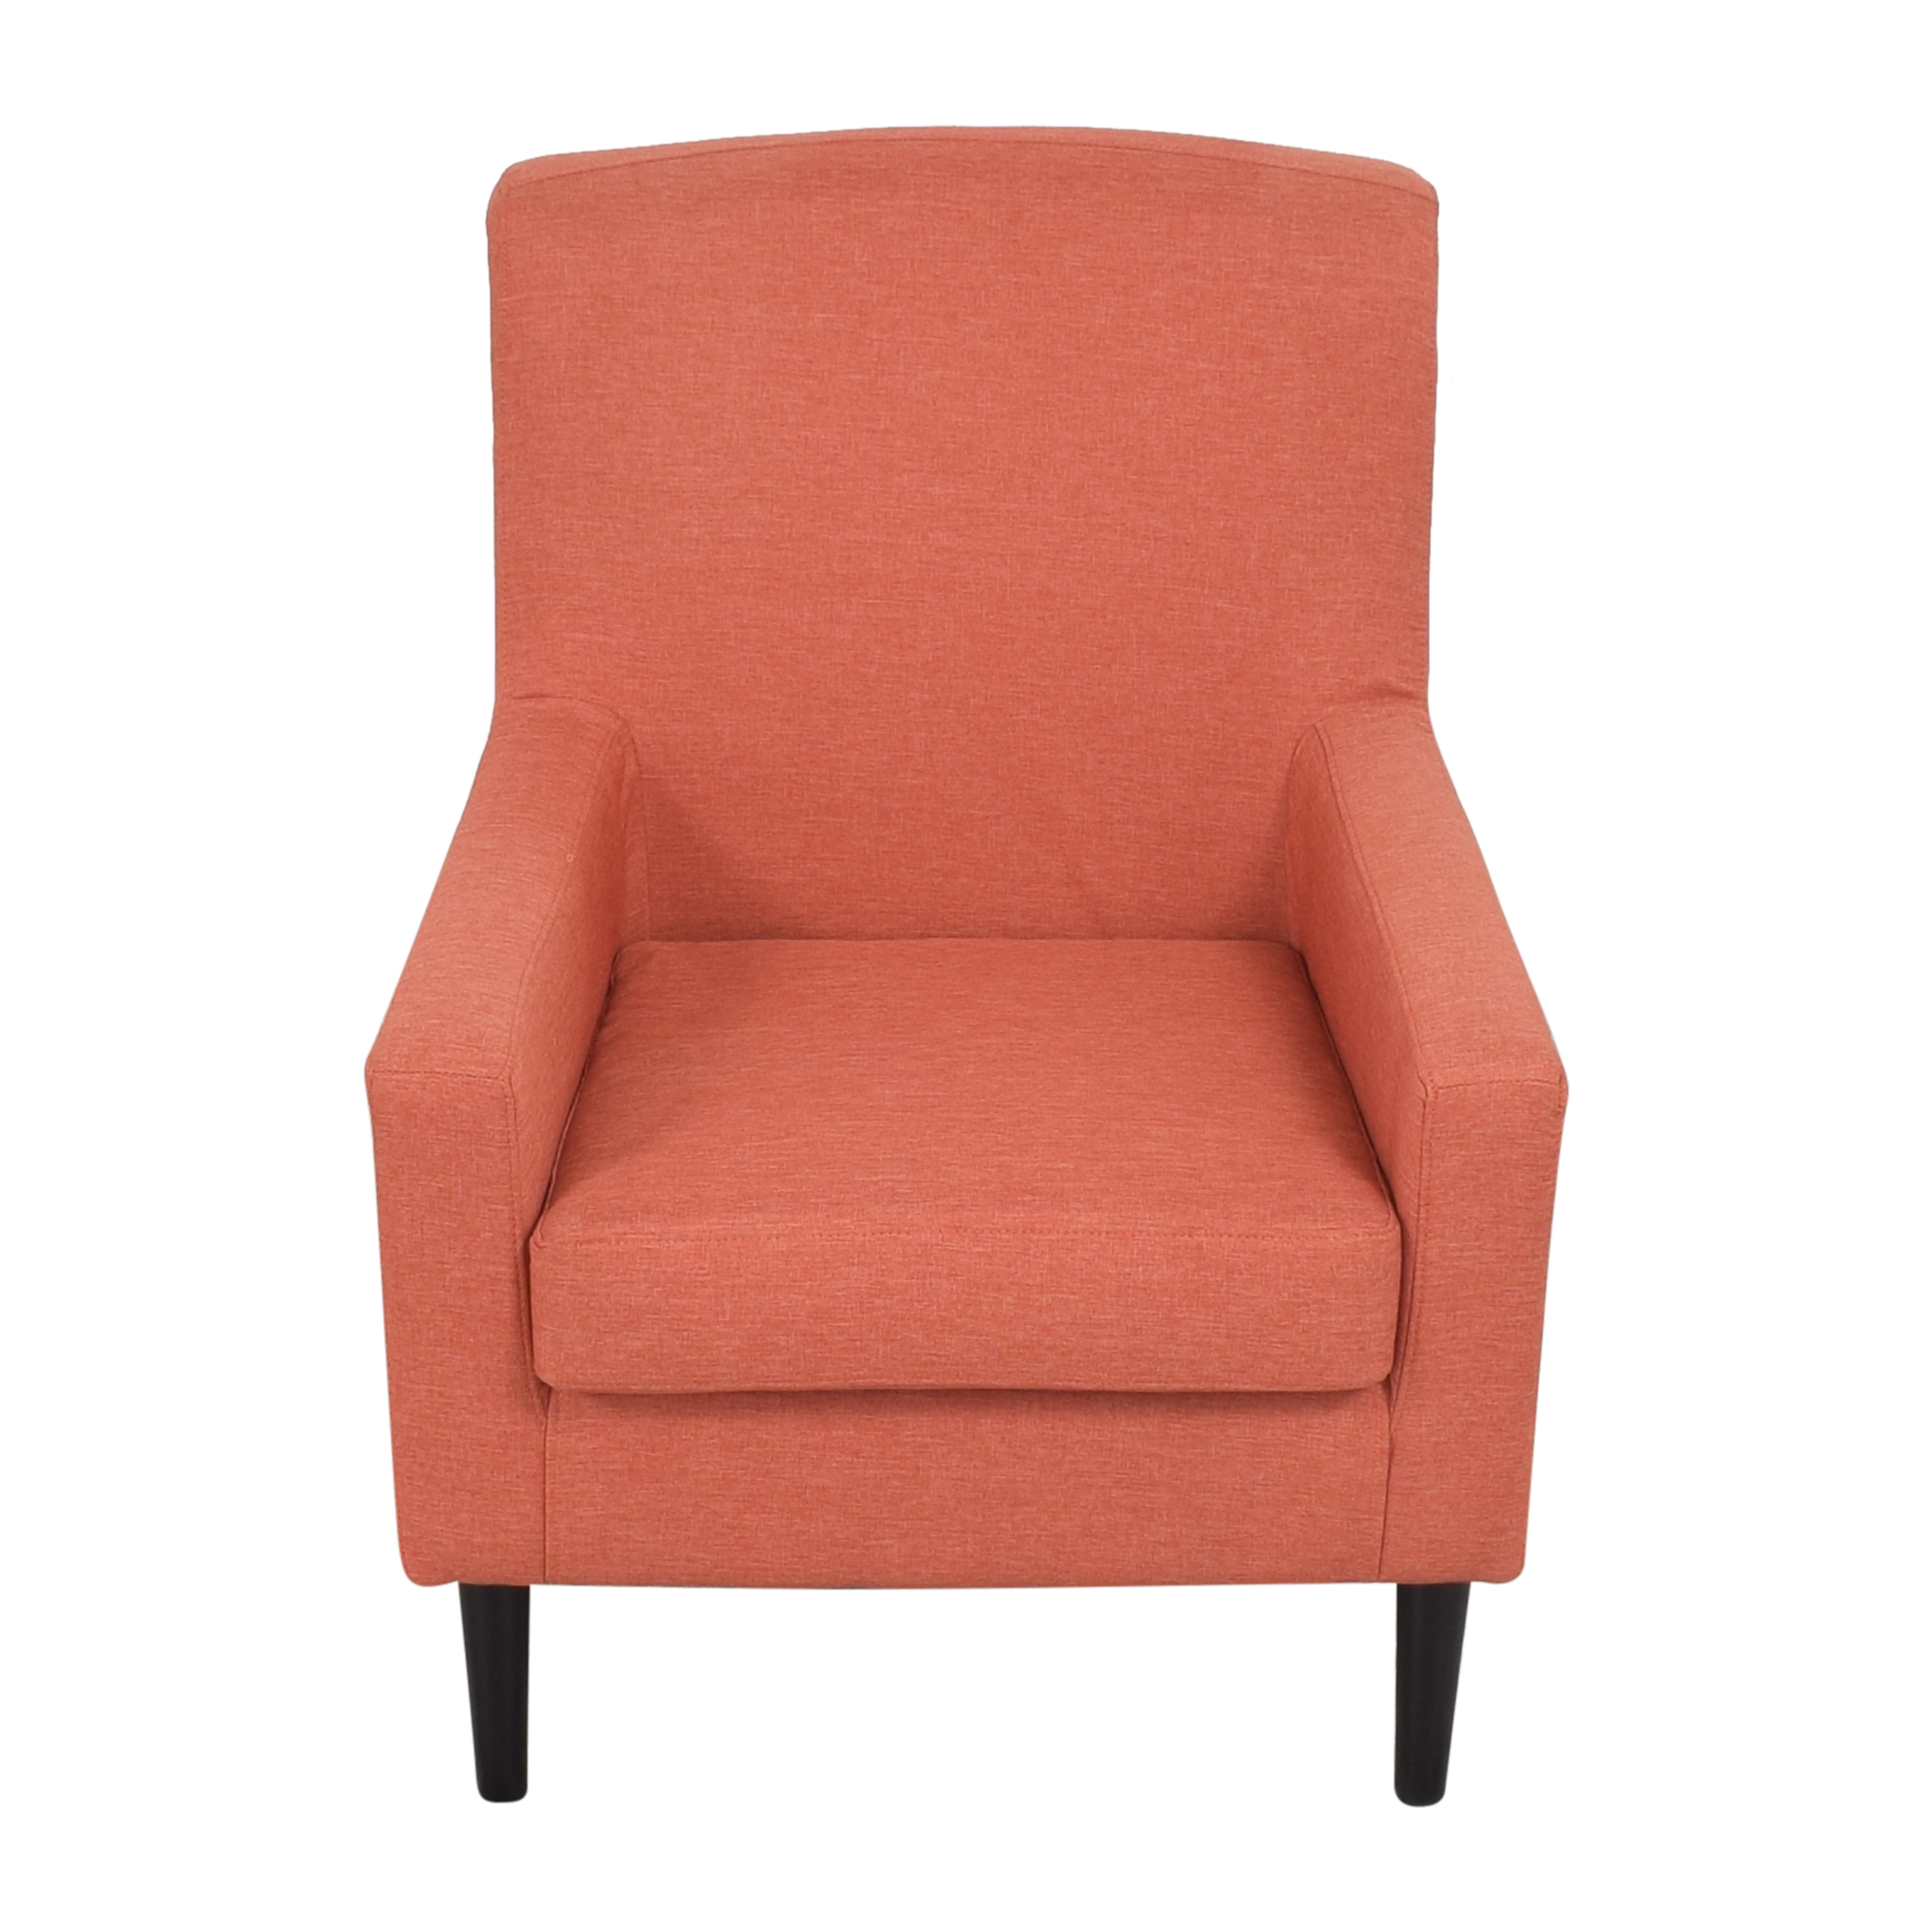 Accent Arm Chair dimensions